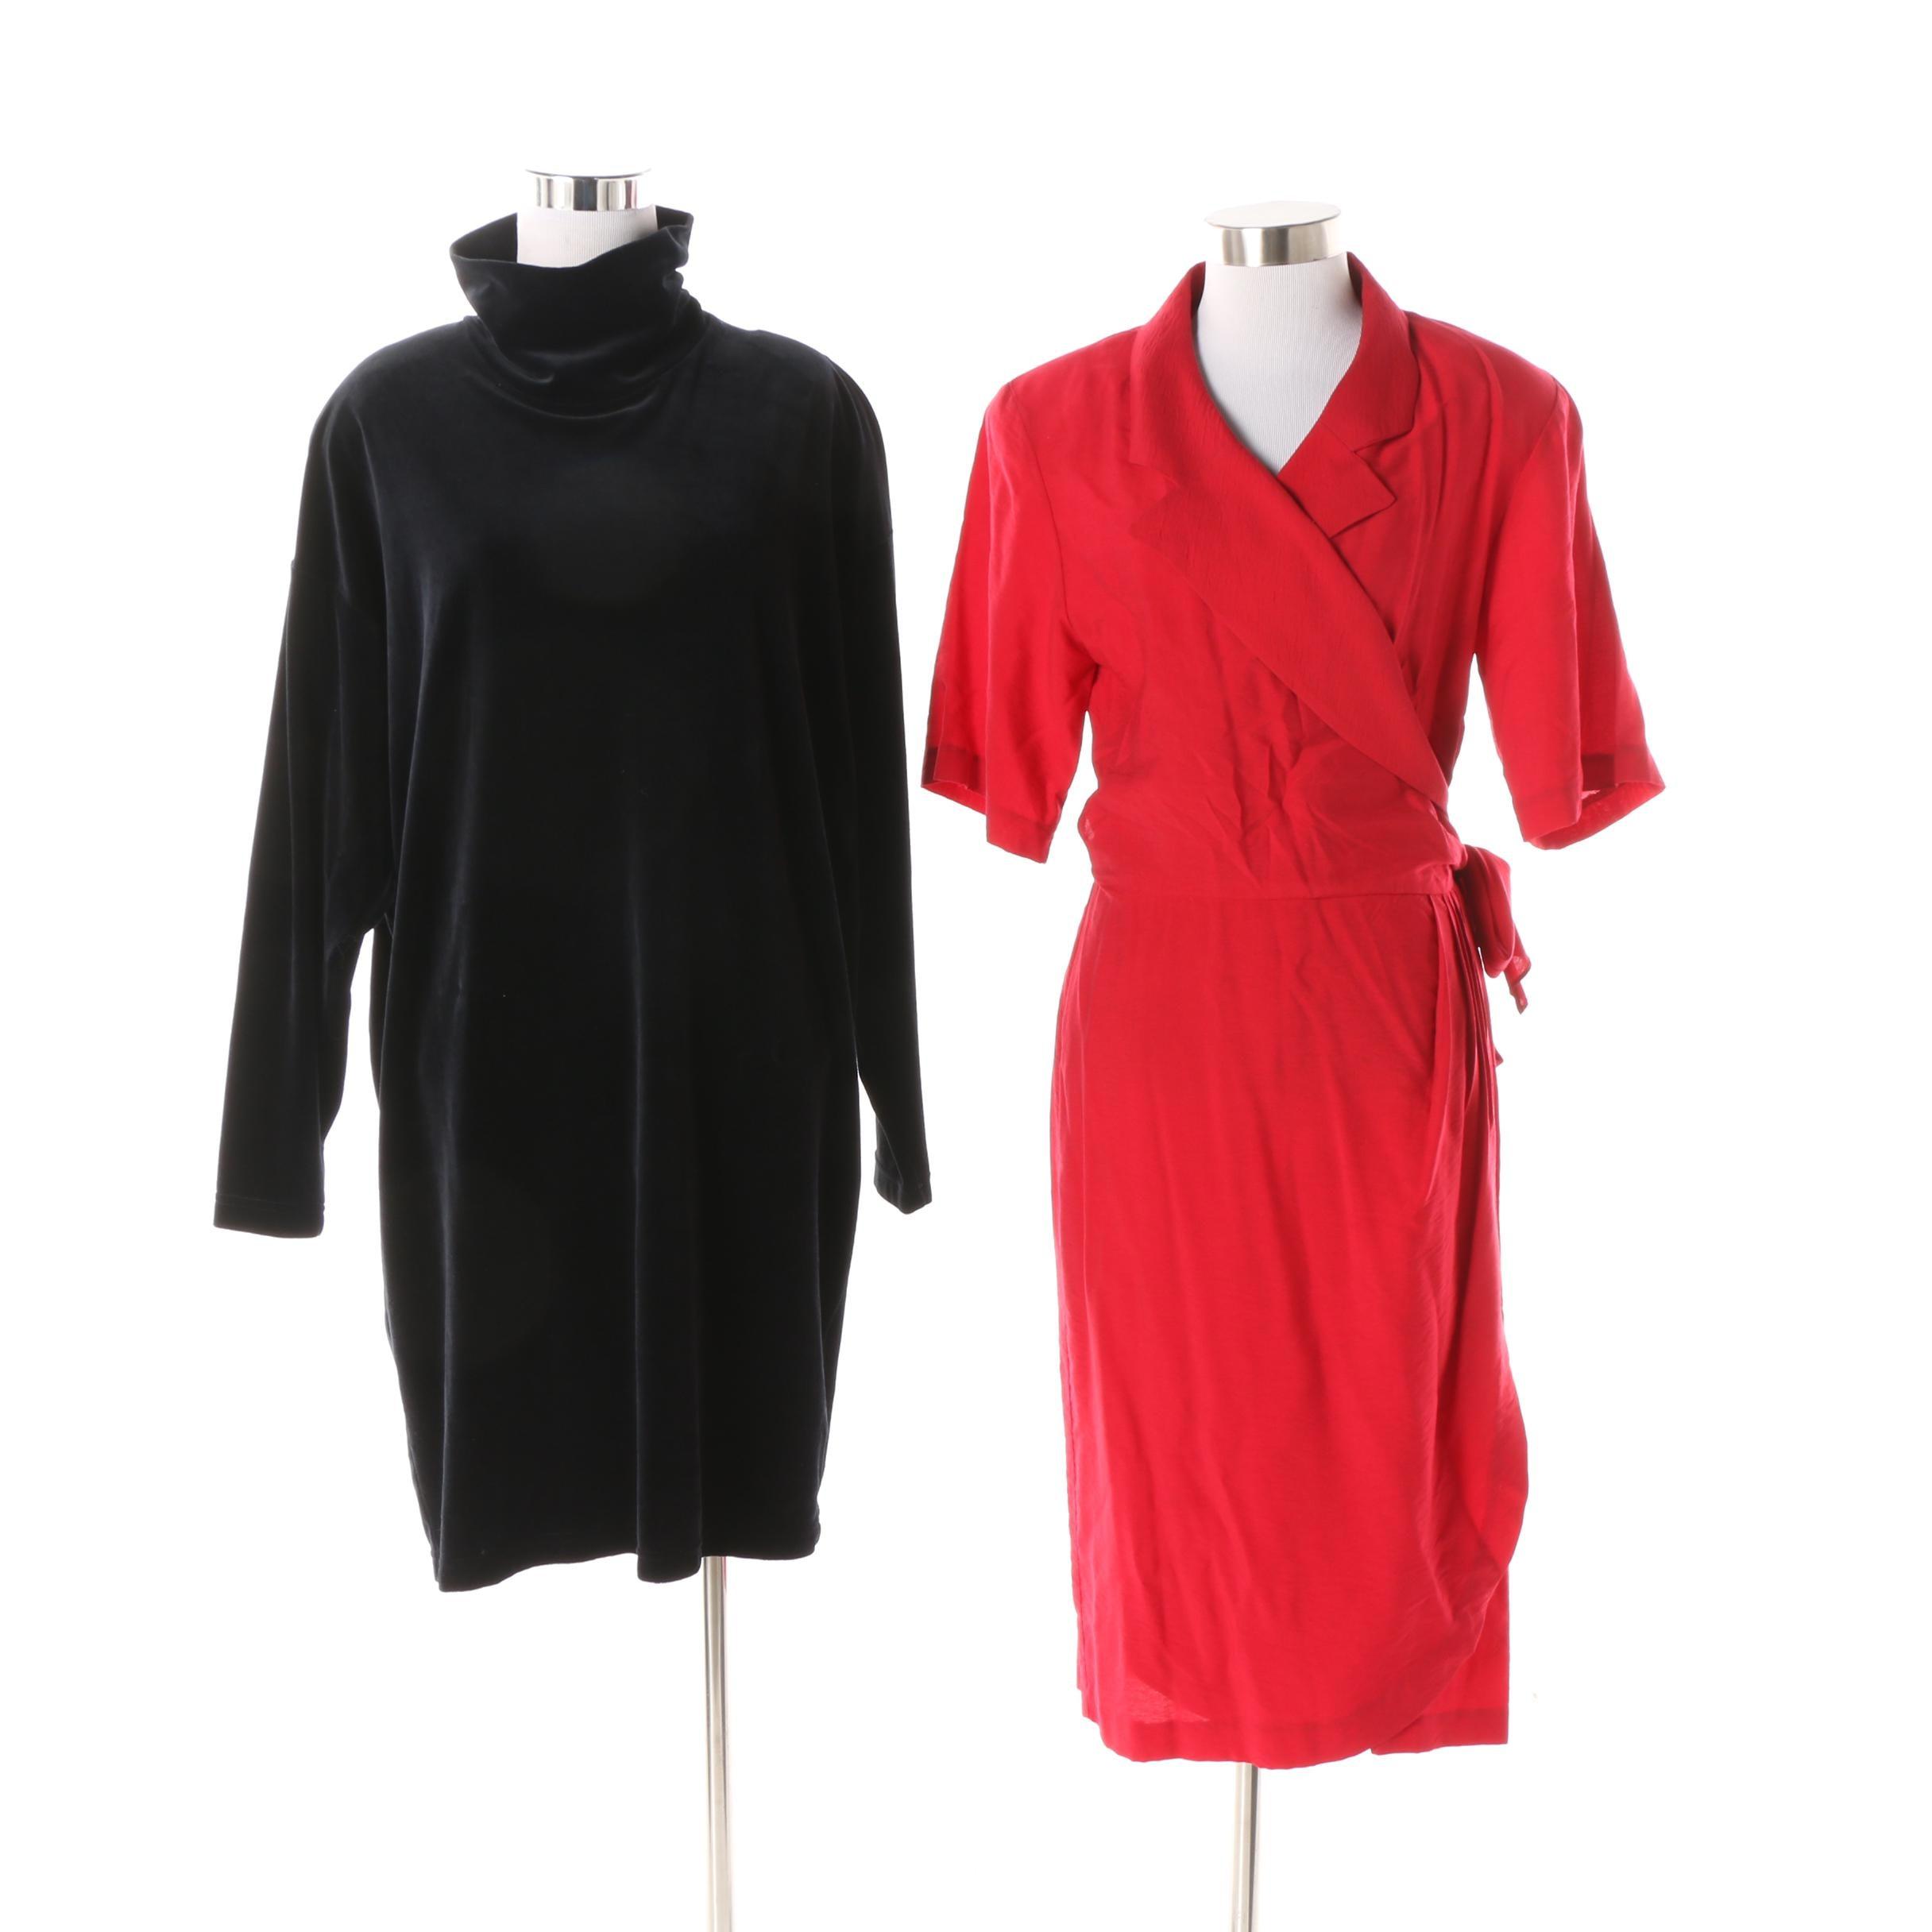 Vintage Ann Taylor Wrap Dress and Tape Measure New York Velvet Turtleneck Dress